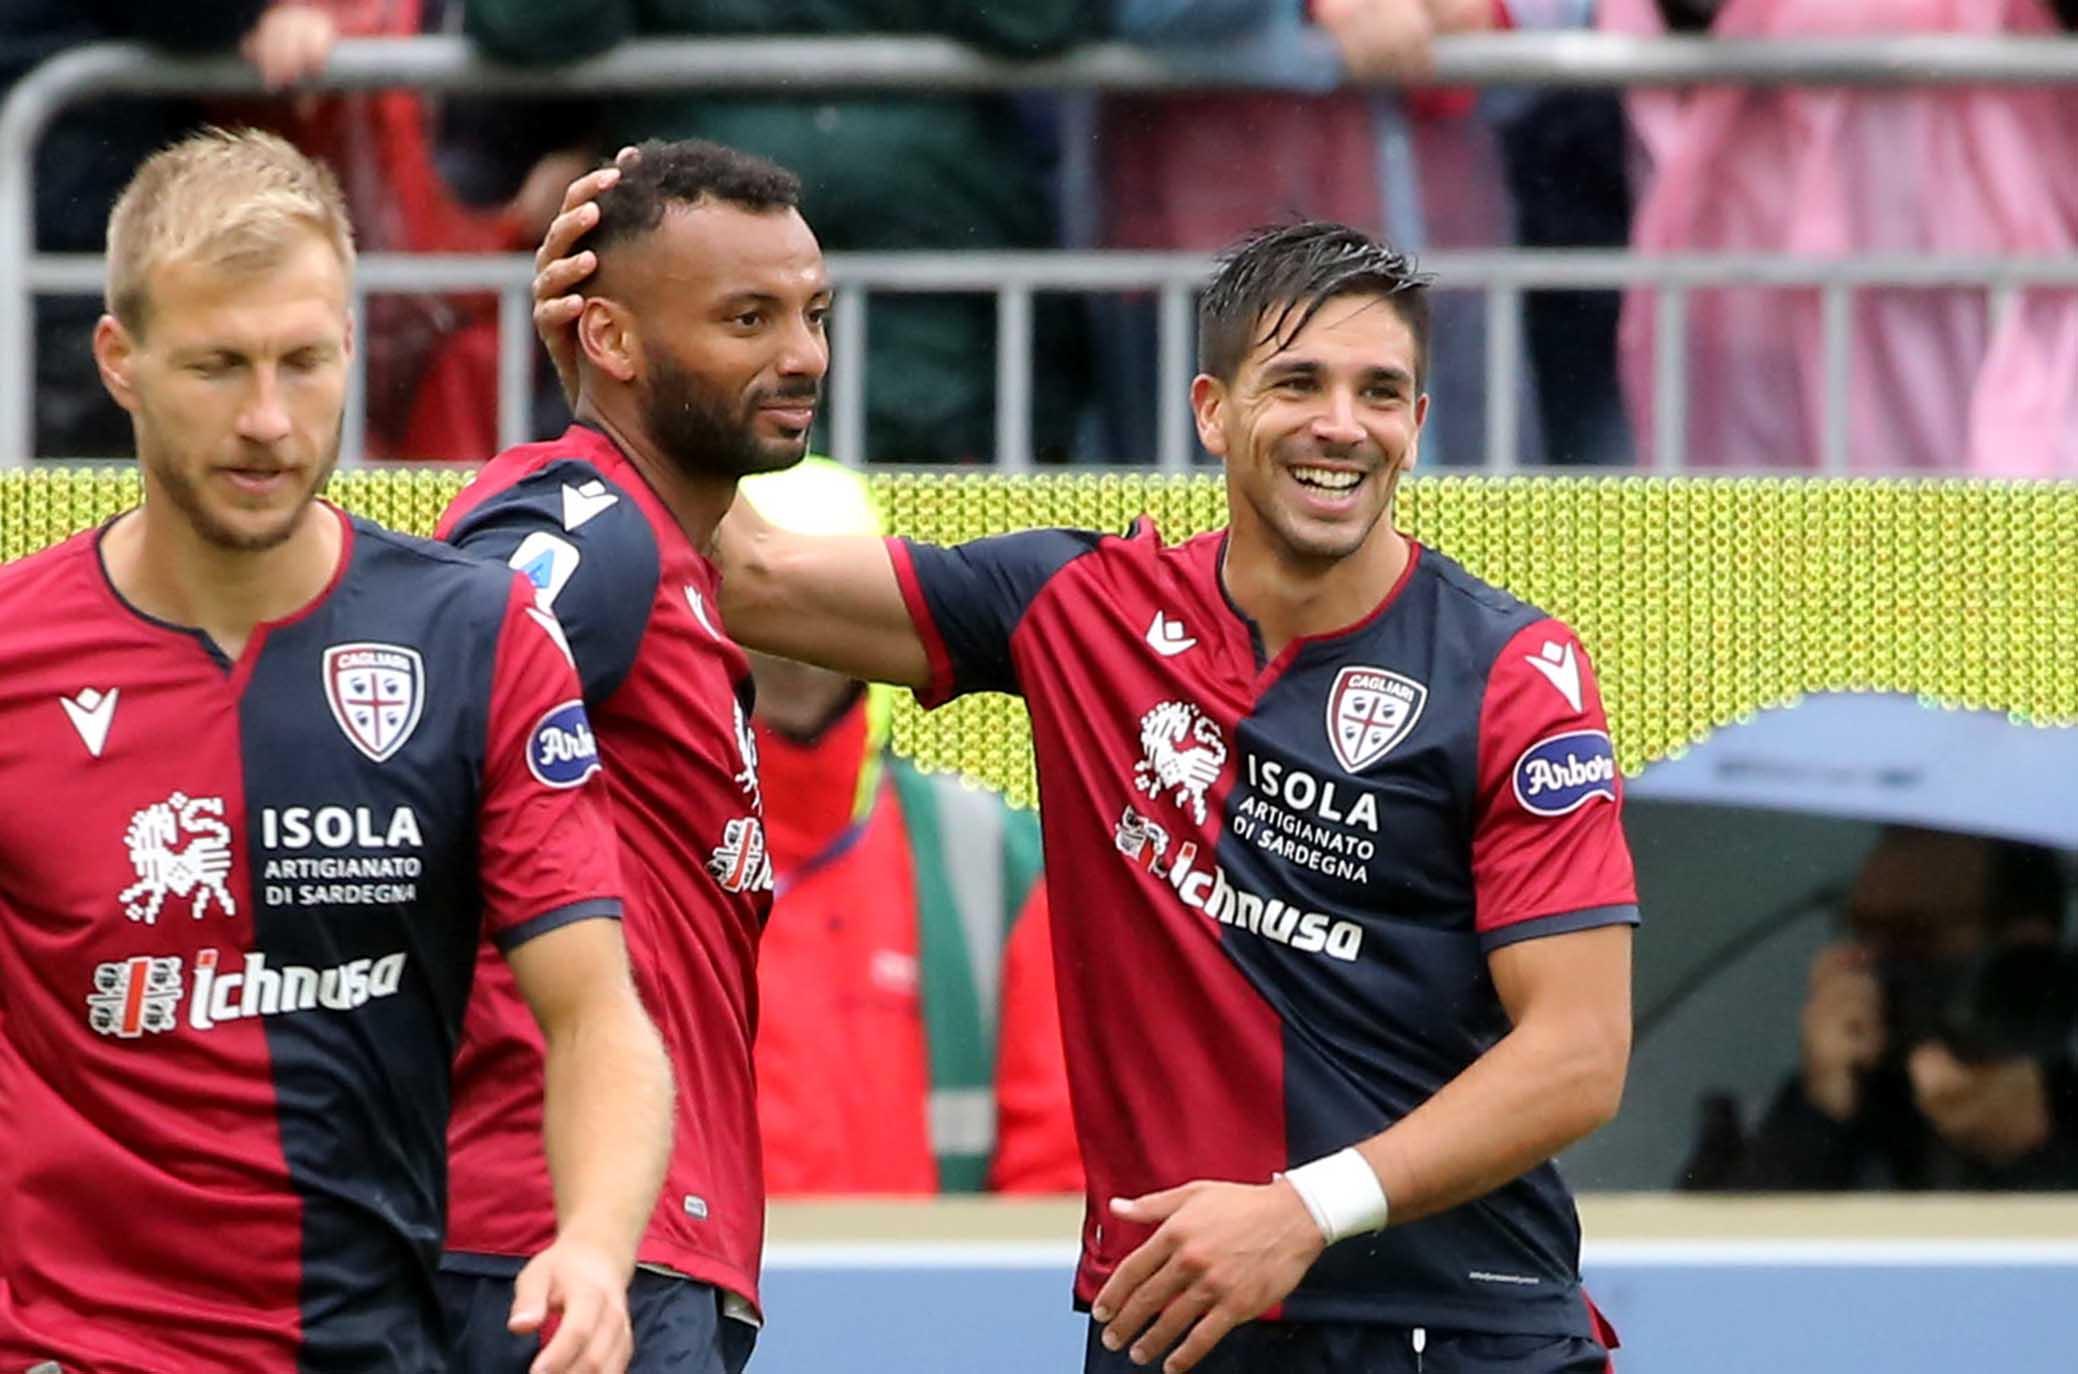 Fantacalcio, le formazioni ufficiali di Atalanta-Juventus: Sarri punta su Dybala e Higuain